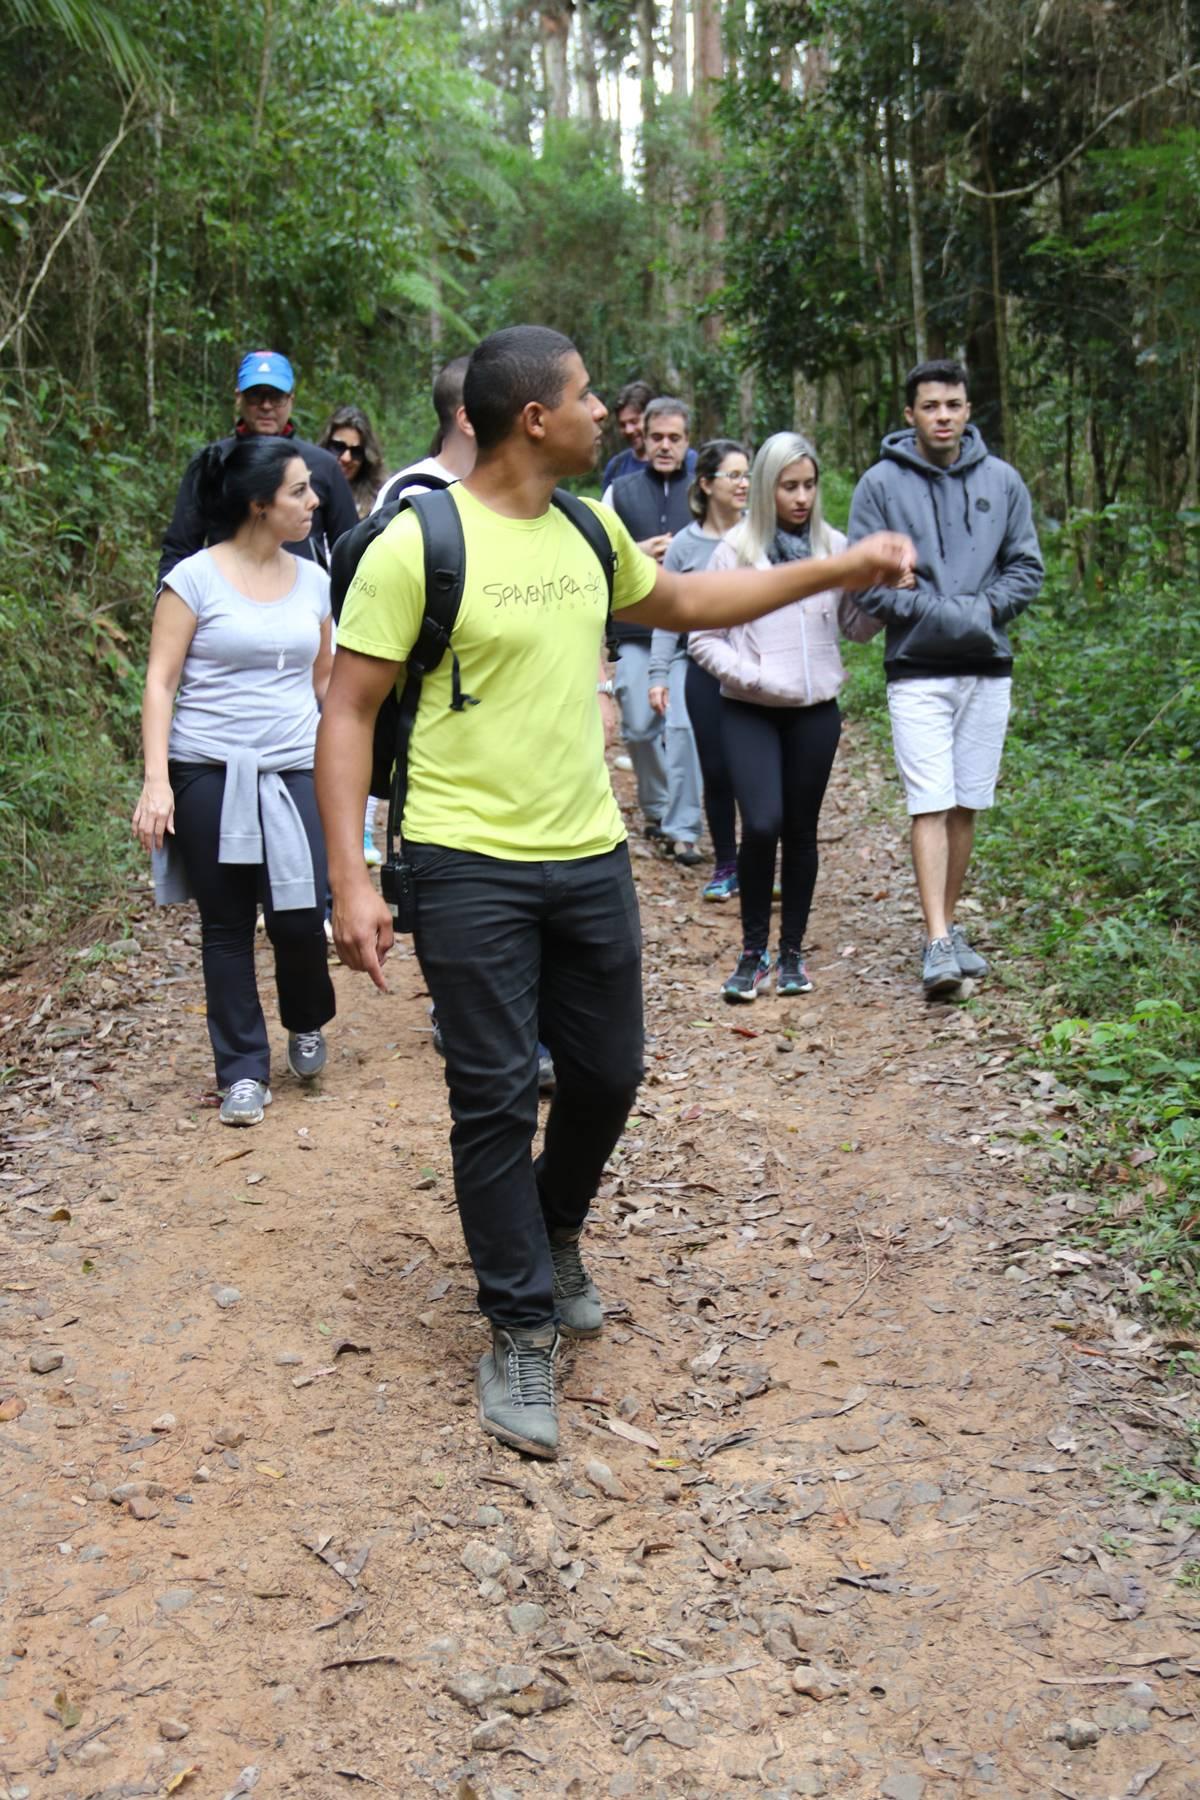 Guia conduz hóspedes que buscam aventuras por trilhas na mata | Eliane Quinalia